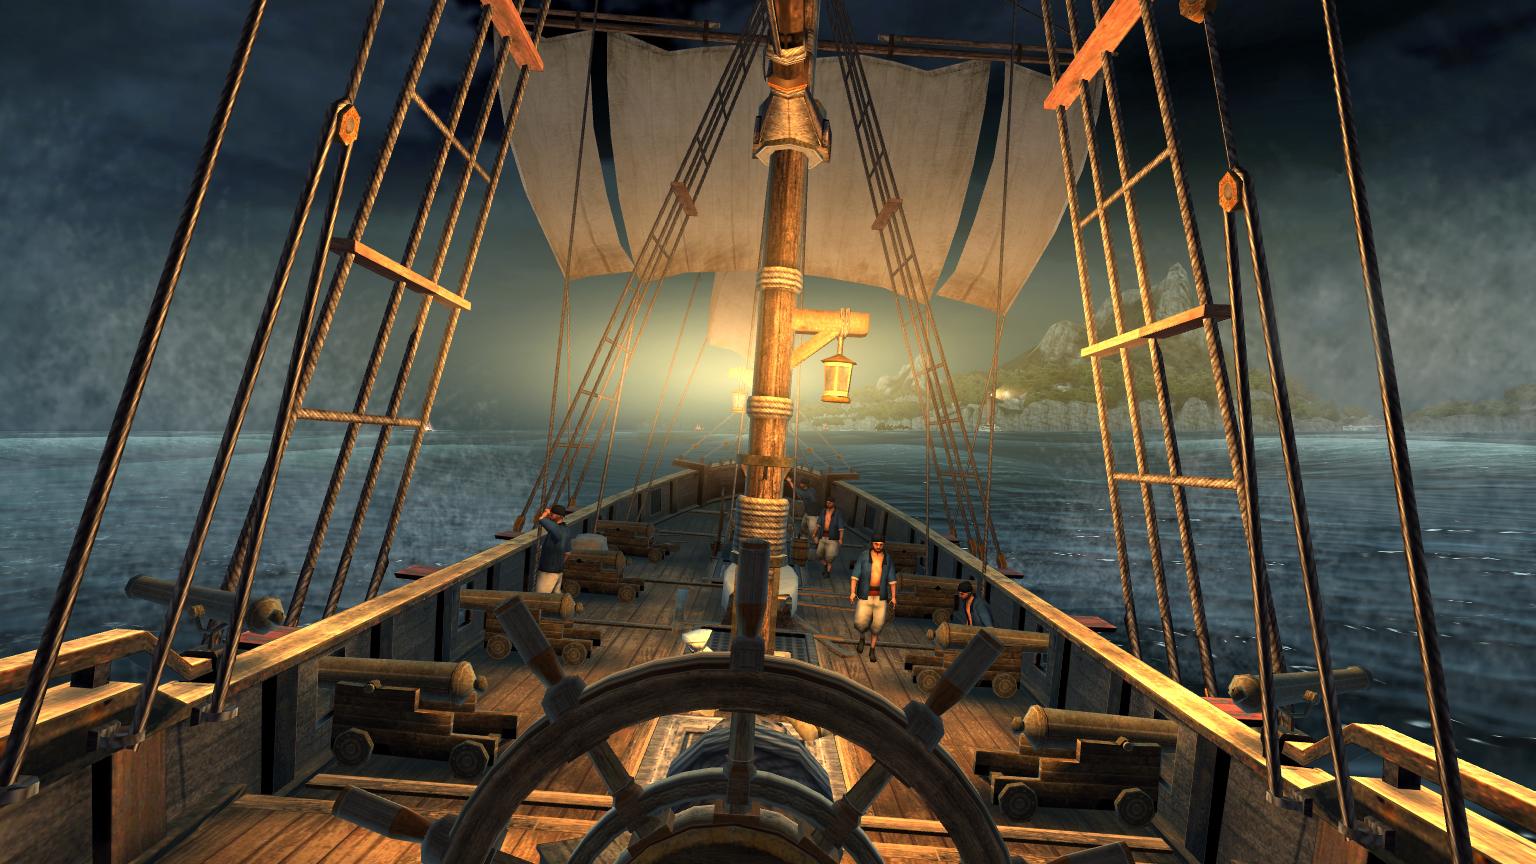 Pirate Ship Deck Backdrop Suche gutes Piratenspi...